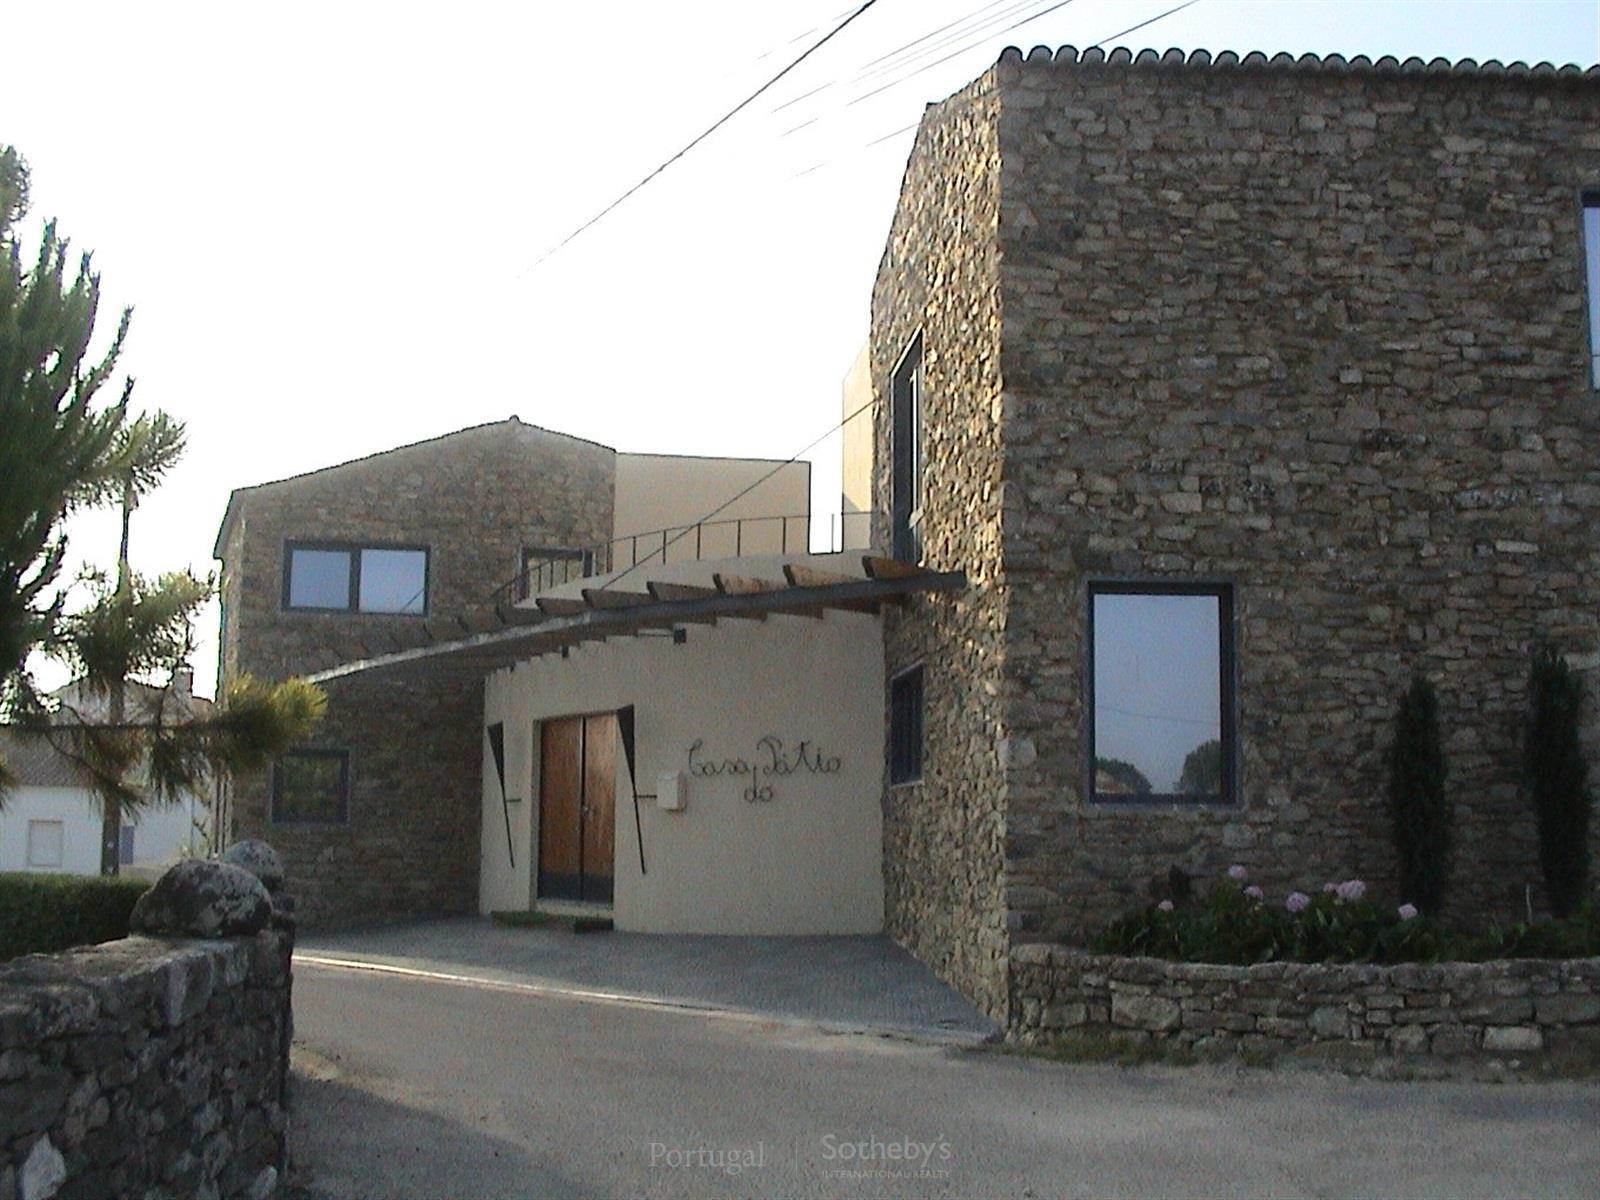 独户住宅 为 销售 在 Detached house, 3 bedrooms, for Sale Sintra, 葡京 葡萄牙